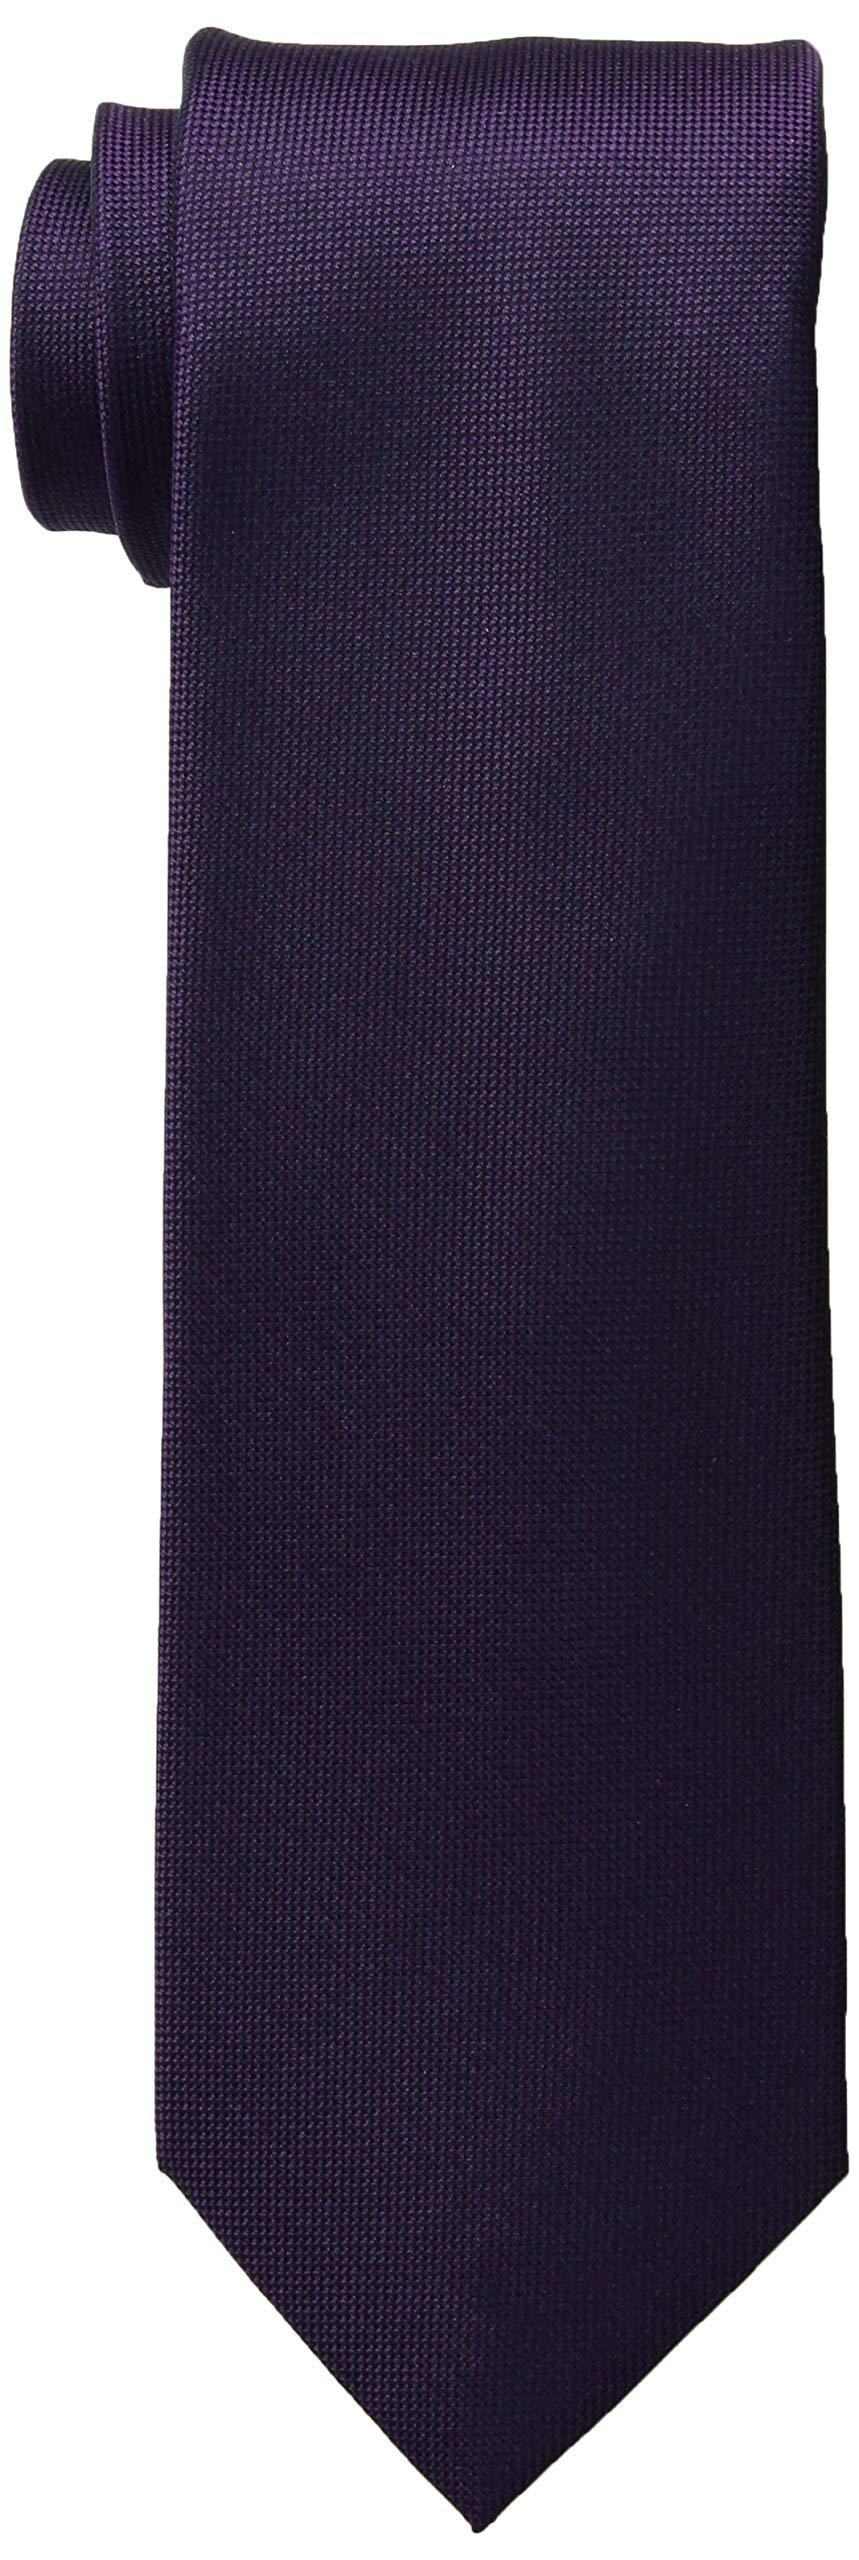 Calvin Klein Men's Silver Spun Solid Tie, Plum, Regular